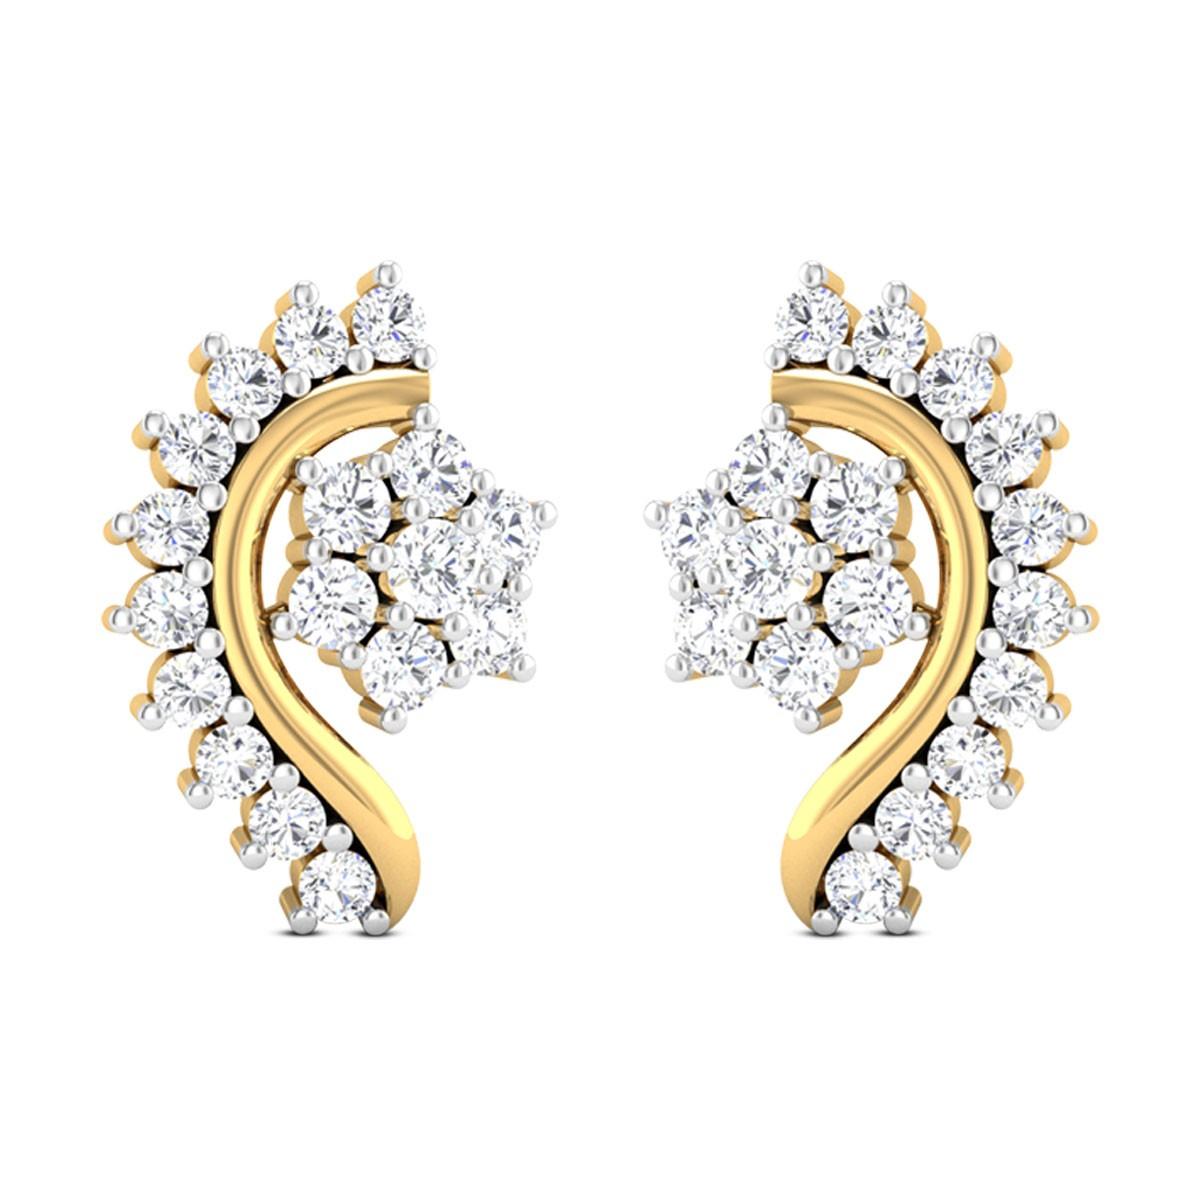 La Amis Diamond Earrings